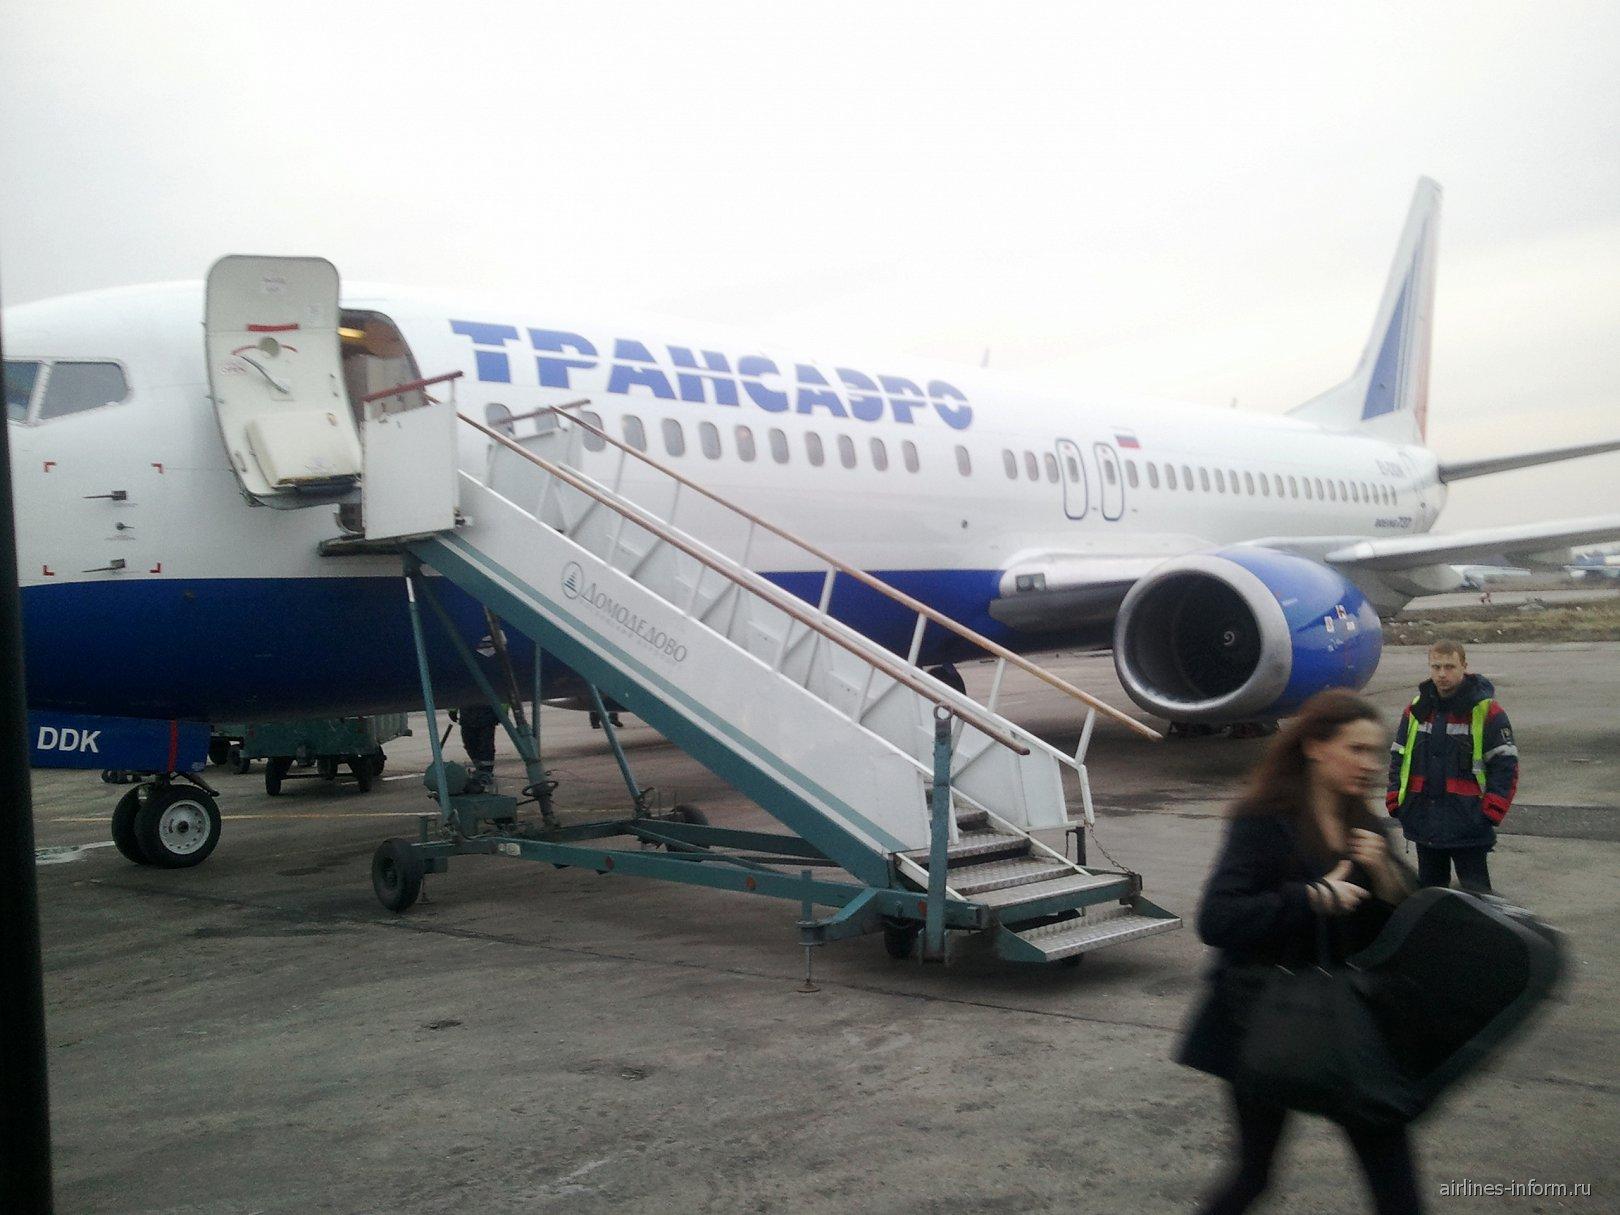 Екатеринбург - Москва на Б-737-400 Трансаэро: тариф Дисконт